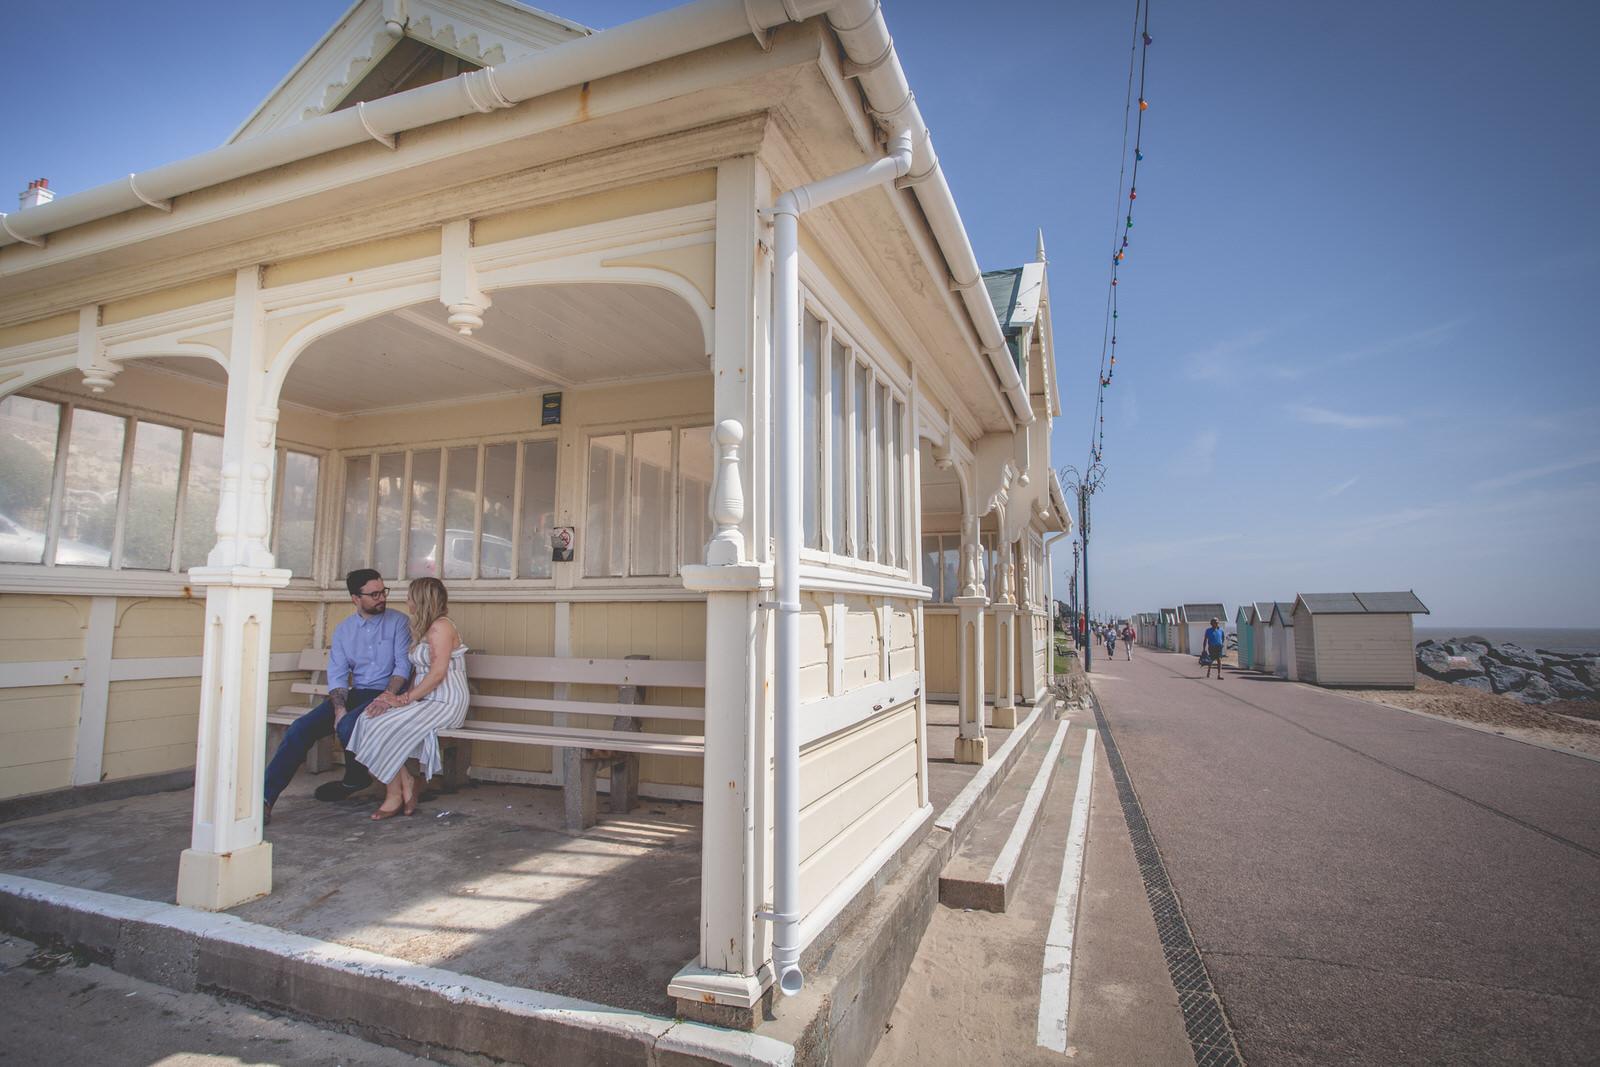 Felixstowe Beachfront Engagement - Sinead  Ryan - 040.jpg